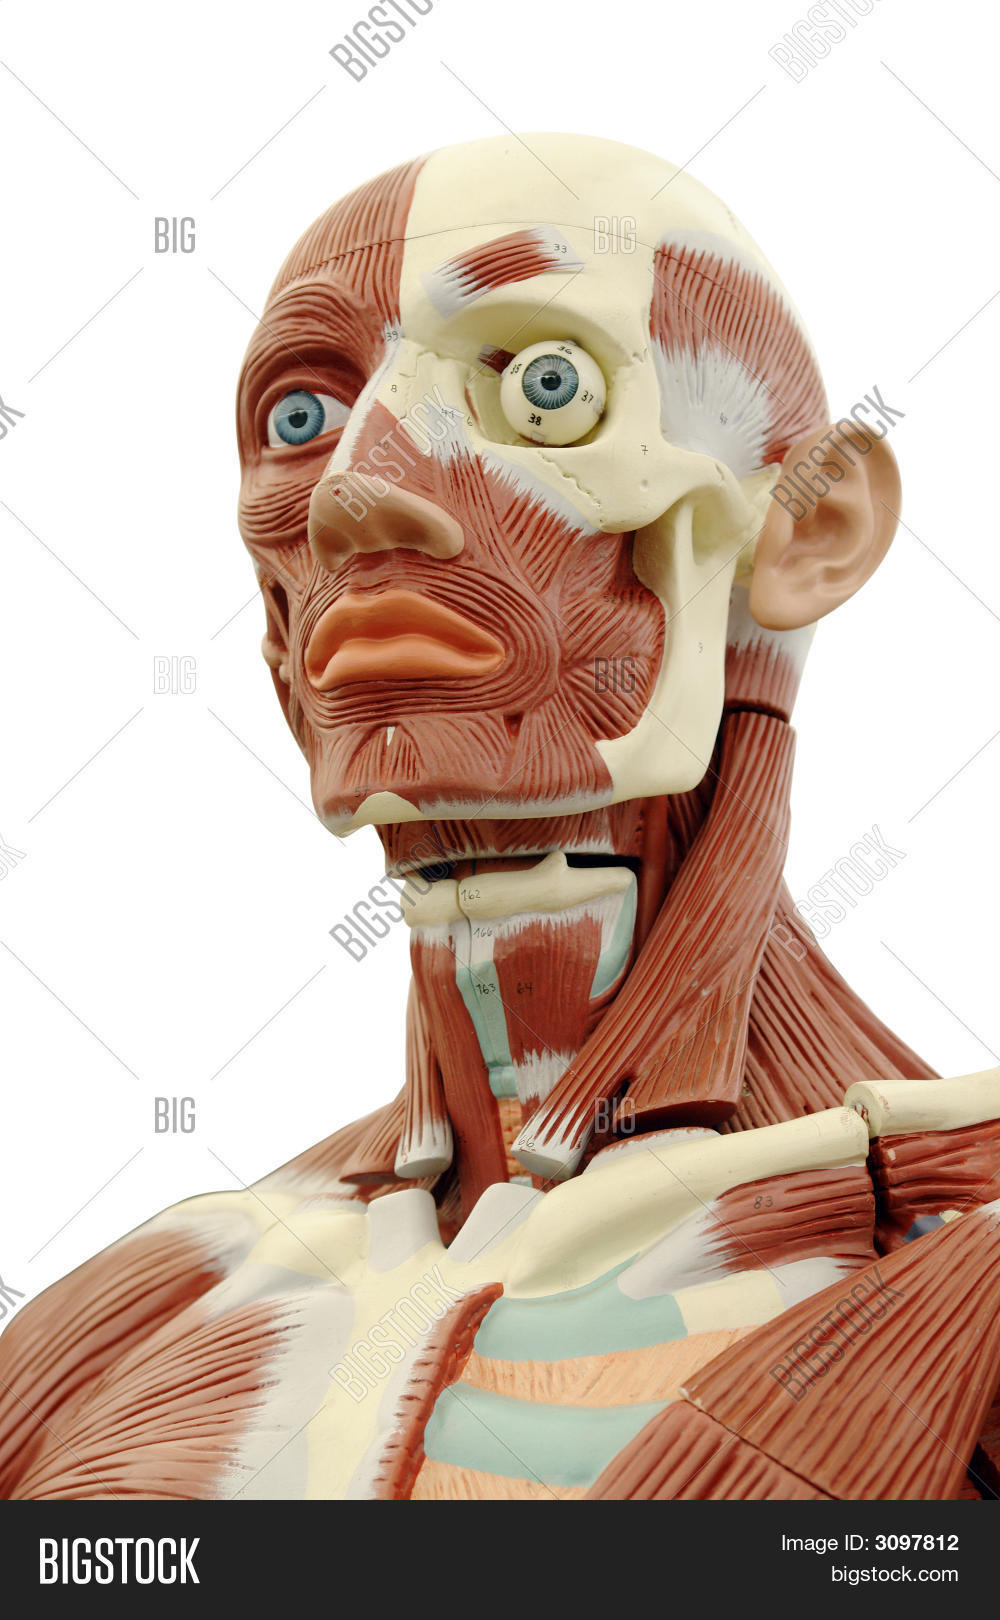 Human Anatomy Image & Photo (Free Trial) | Bigstock